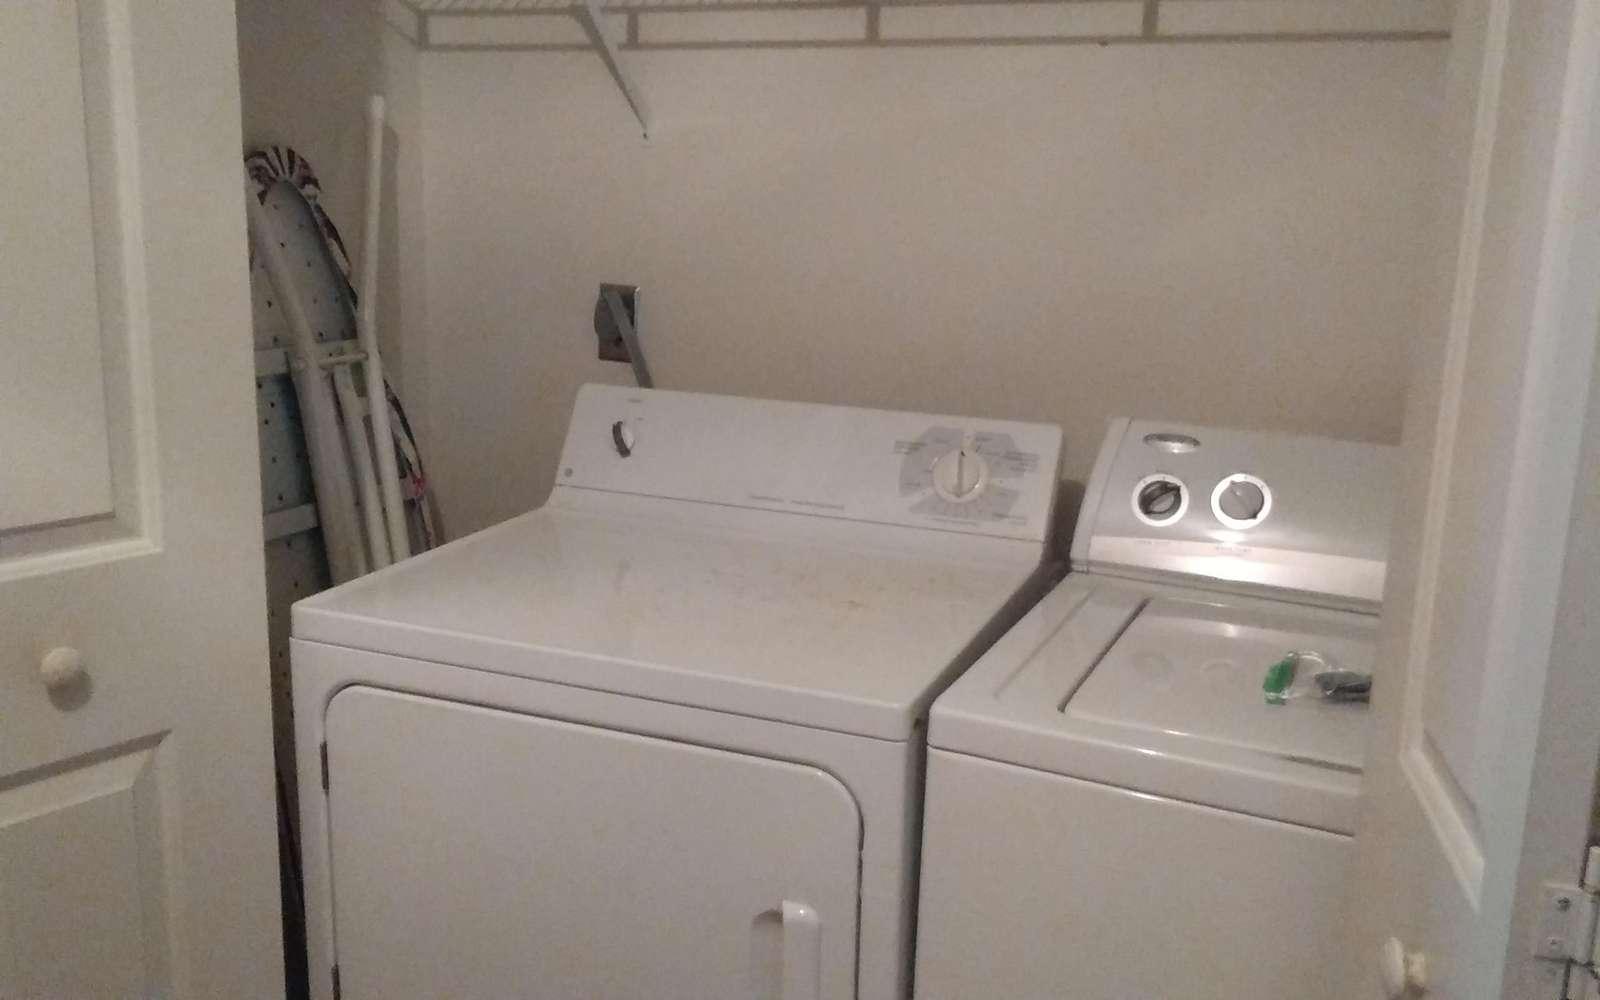 Second Floor Laundry Center